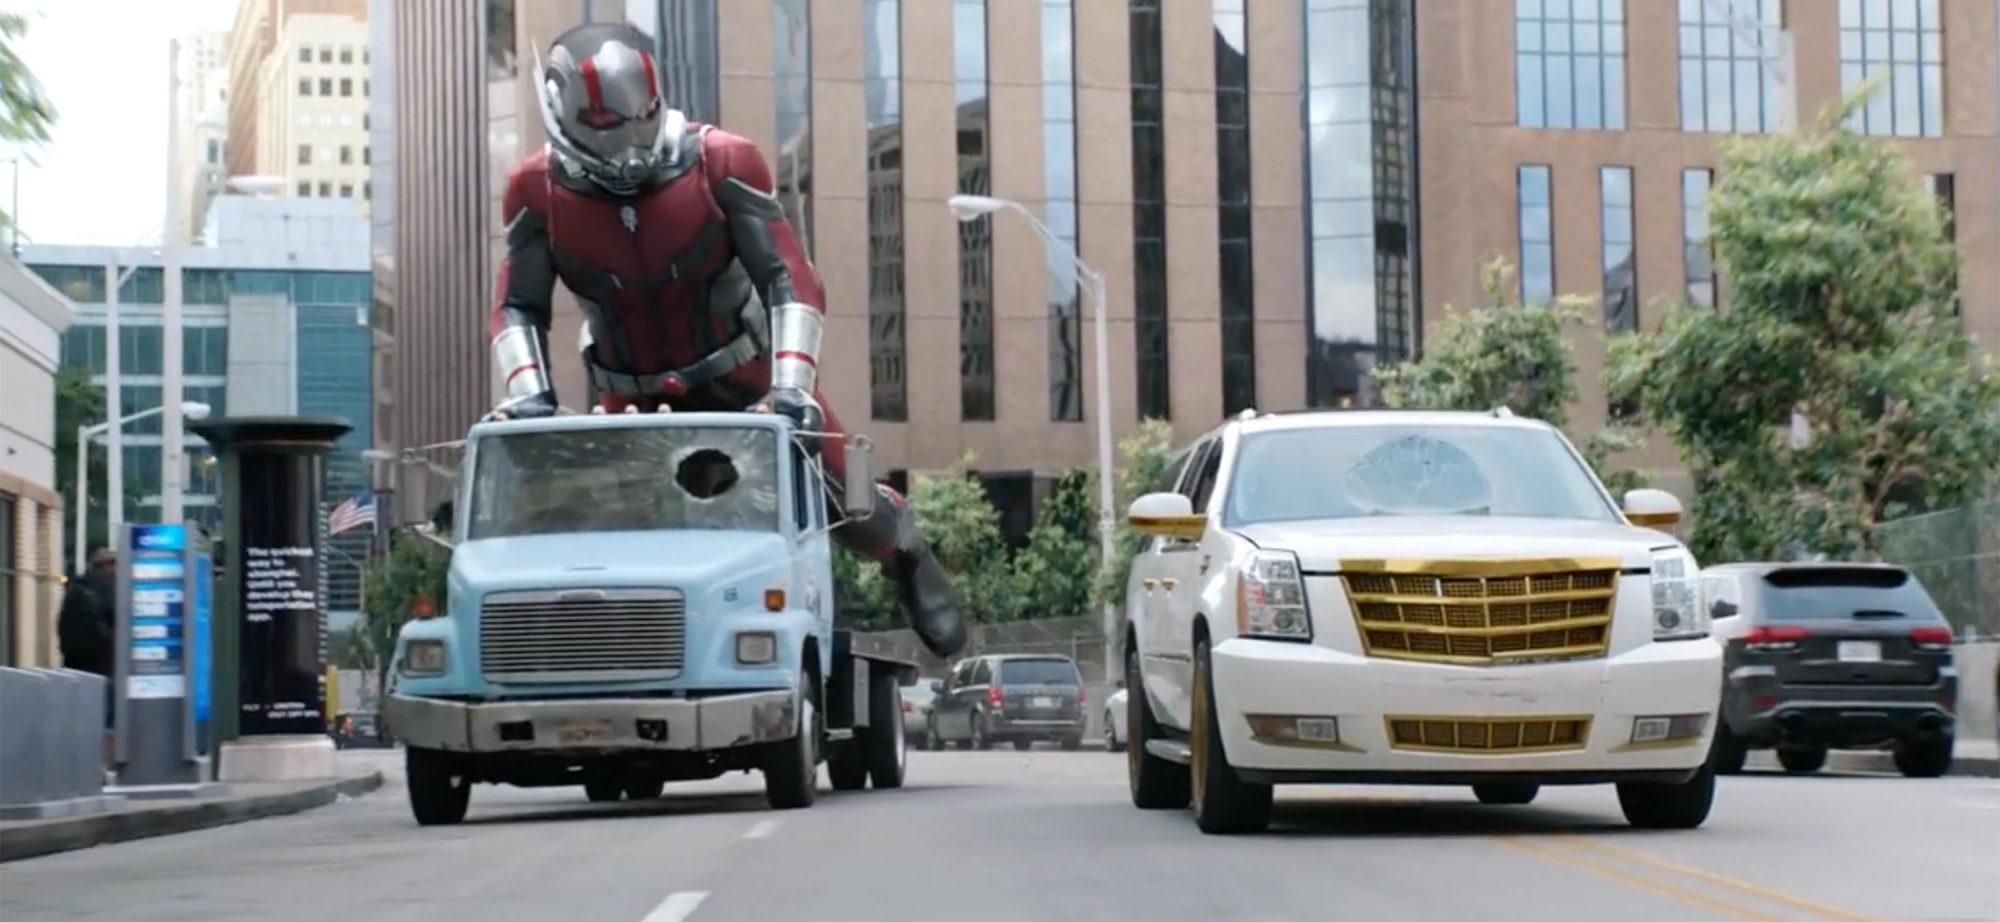 ant-man-wasp-trailer-2